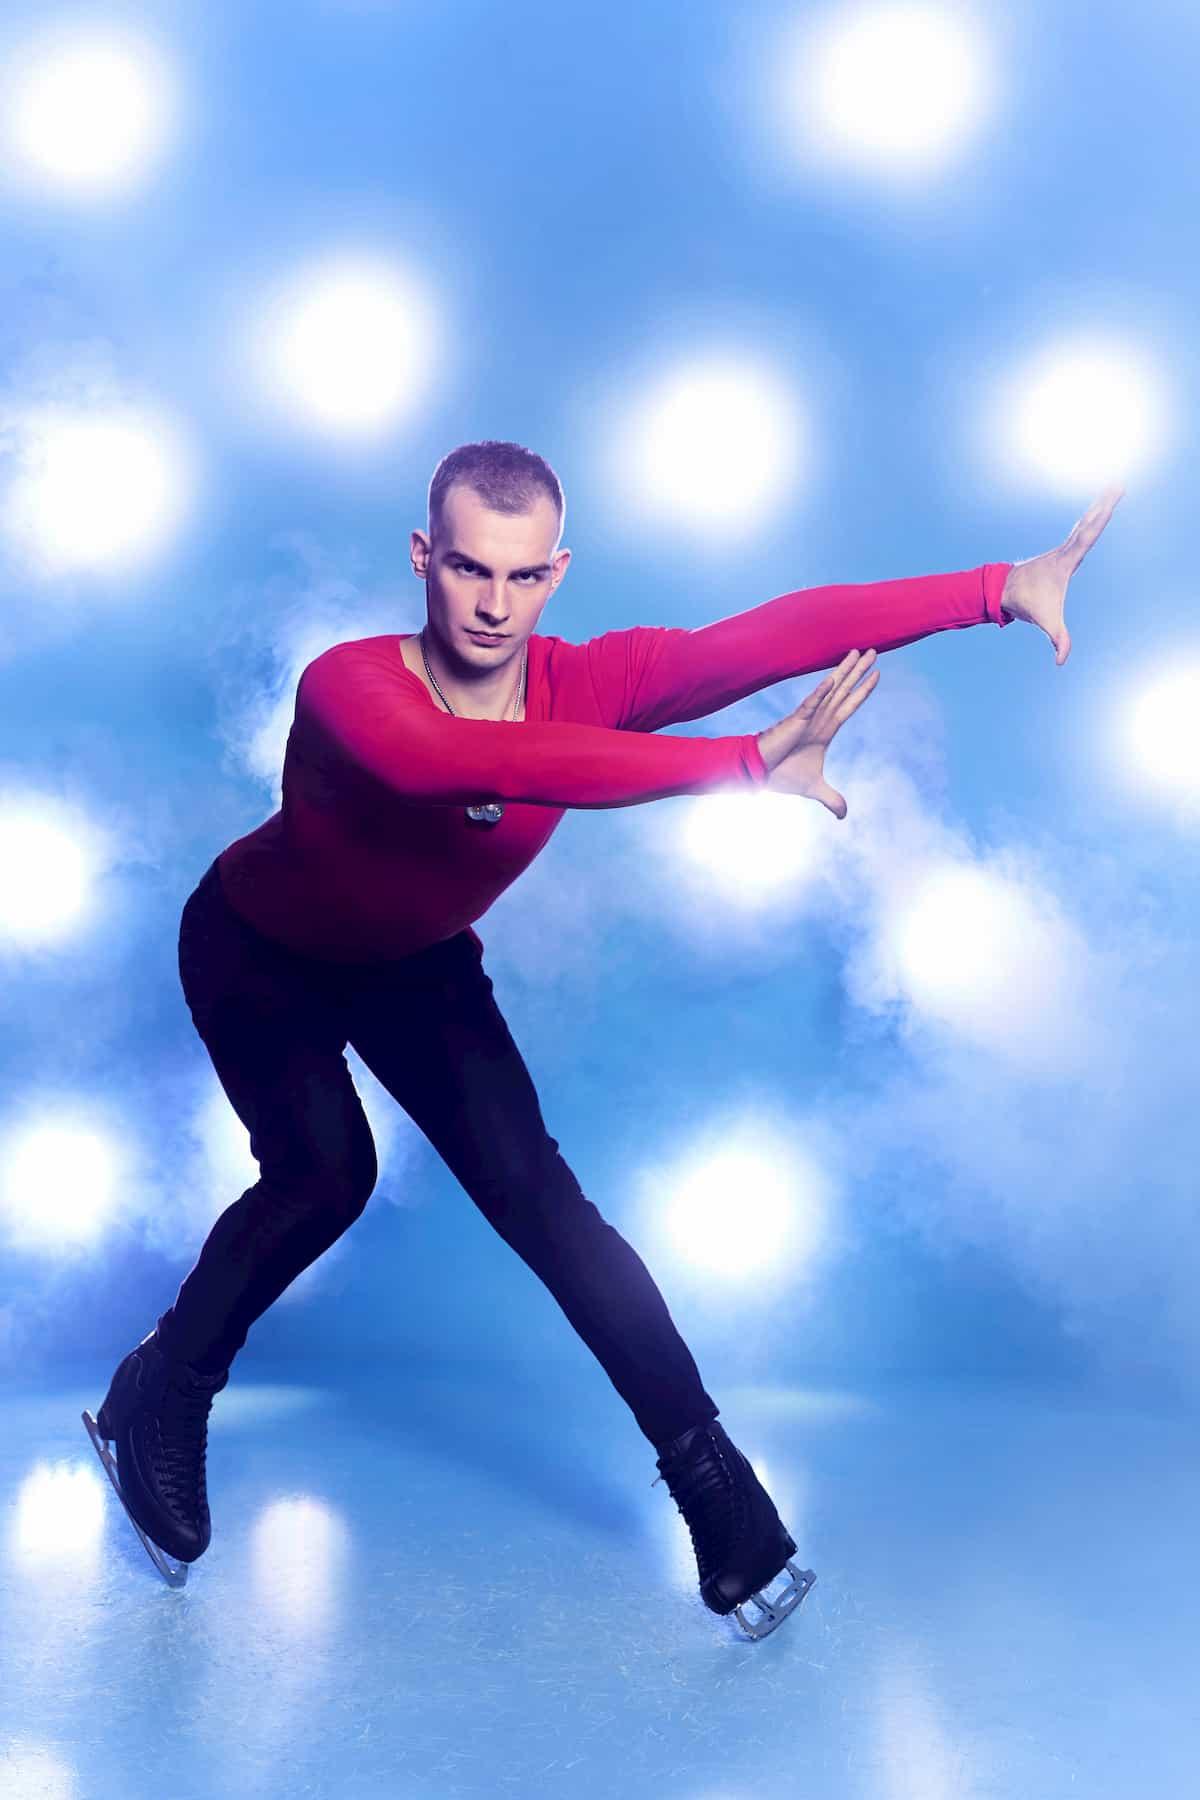 Erich Stehfest Promi-Kandidat Dancing on Ice 2019 Herbst-Winter 2te Staffel